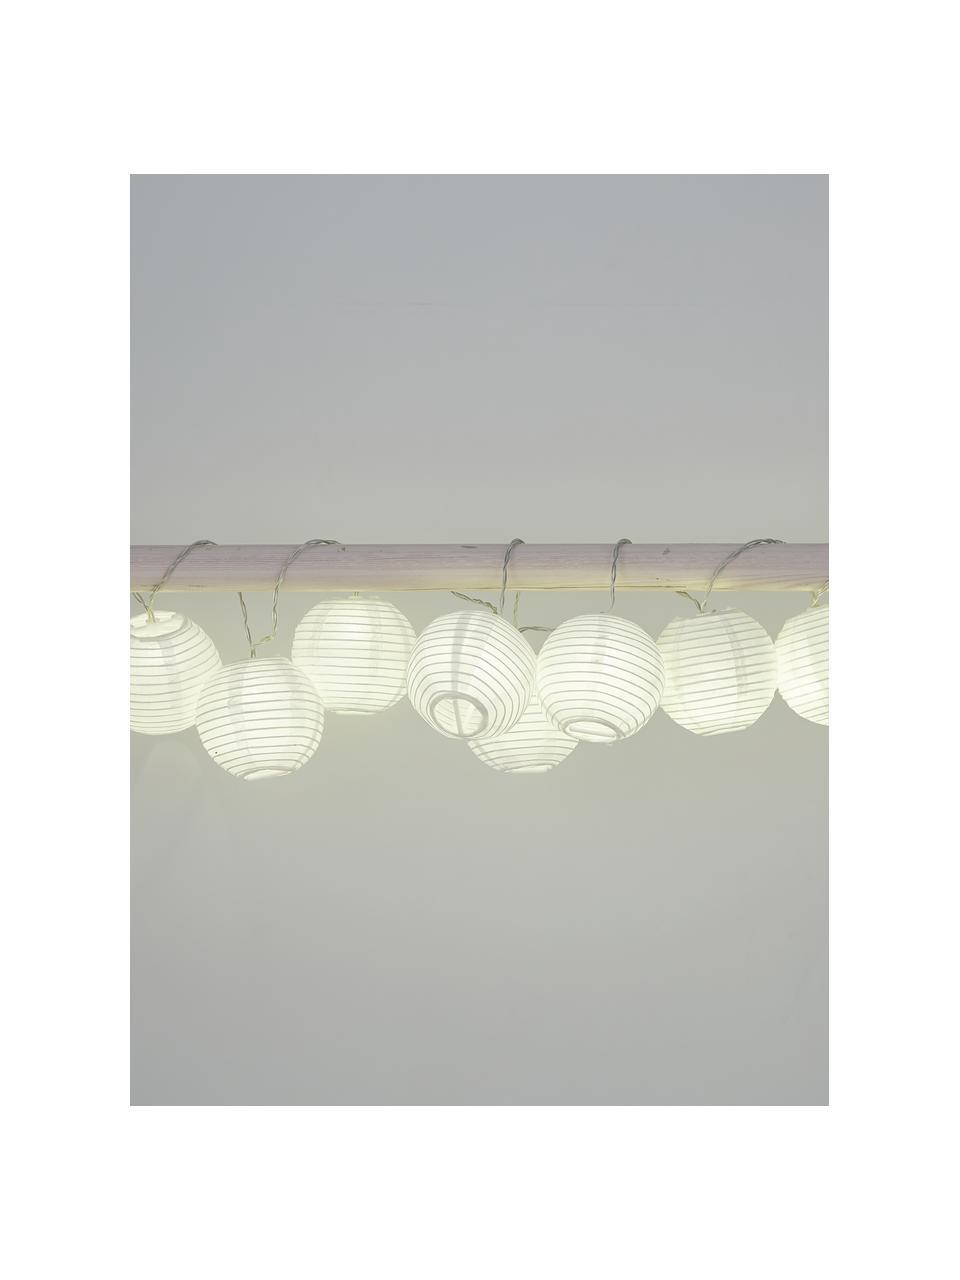 Ghirlanda  a LED Festival, 300 cm, 10 lampioni, Lanterne: carta, Bianco, Lung. 300 cm